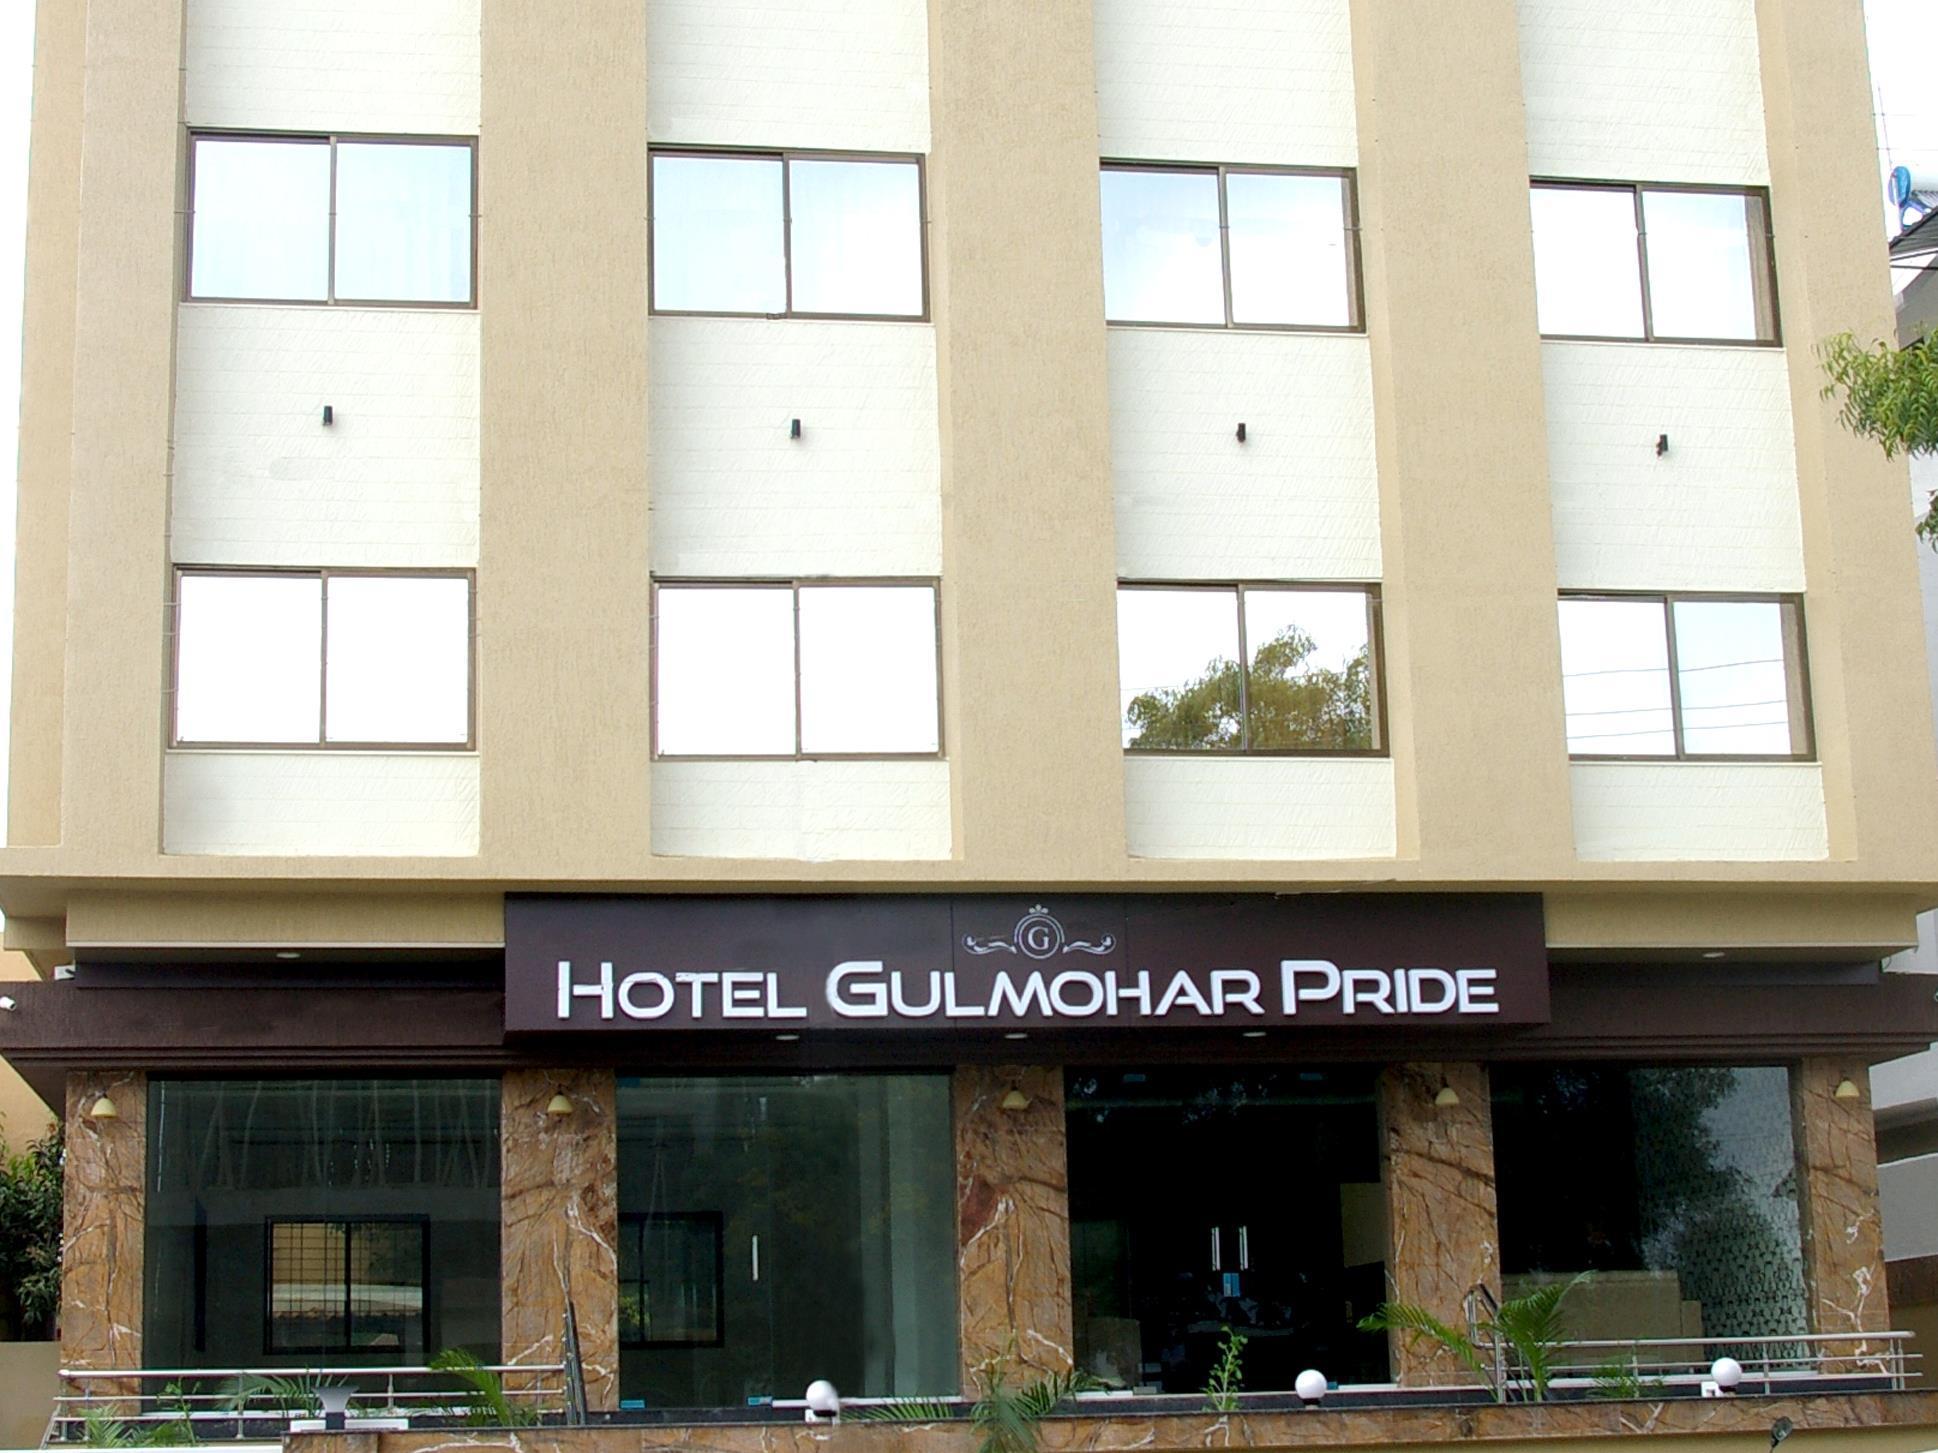 Hotel Gulmohar Pride